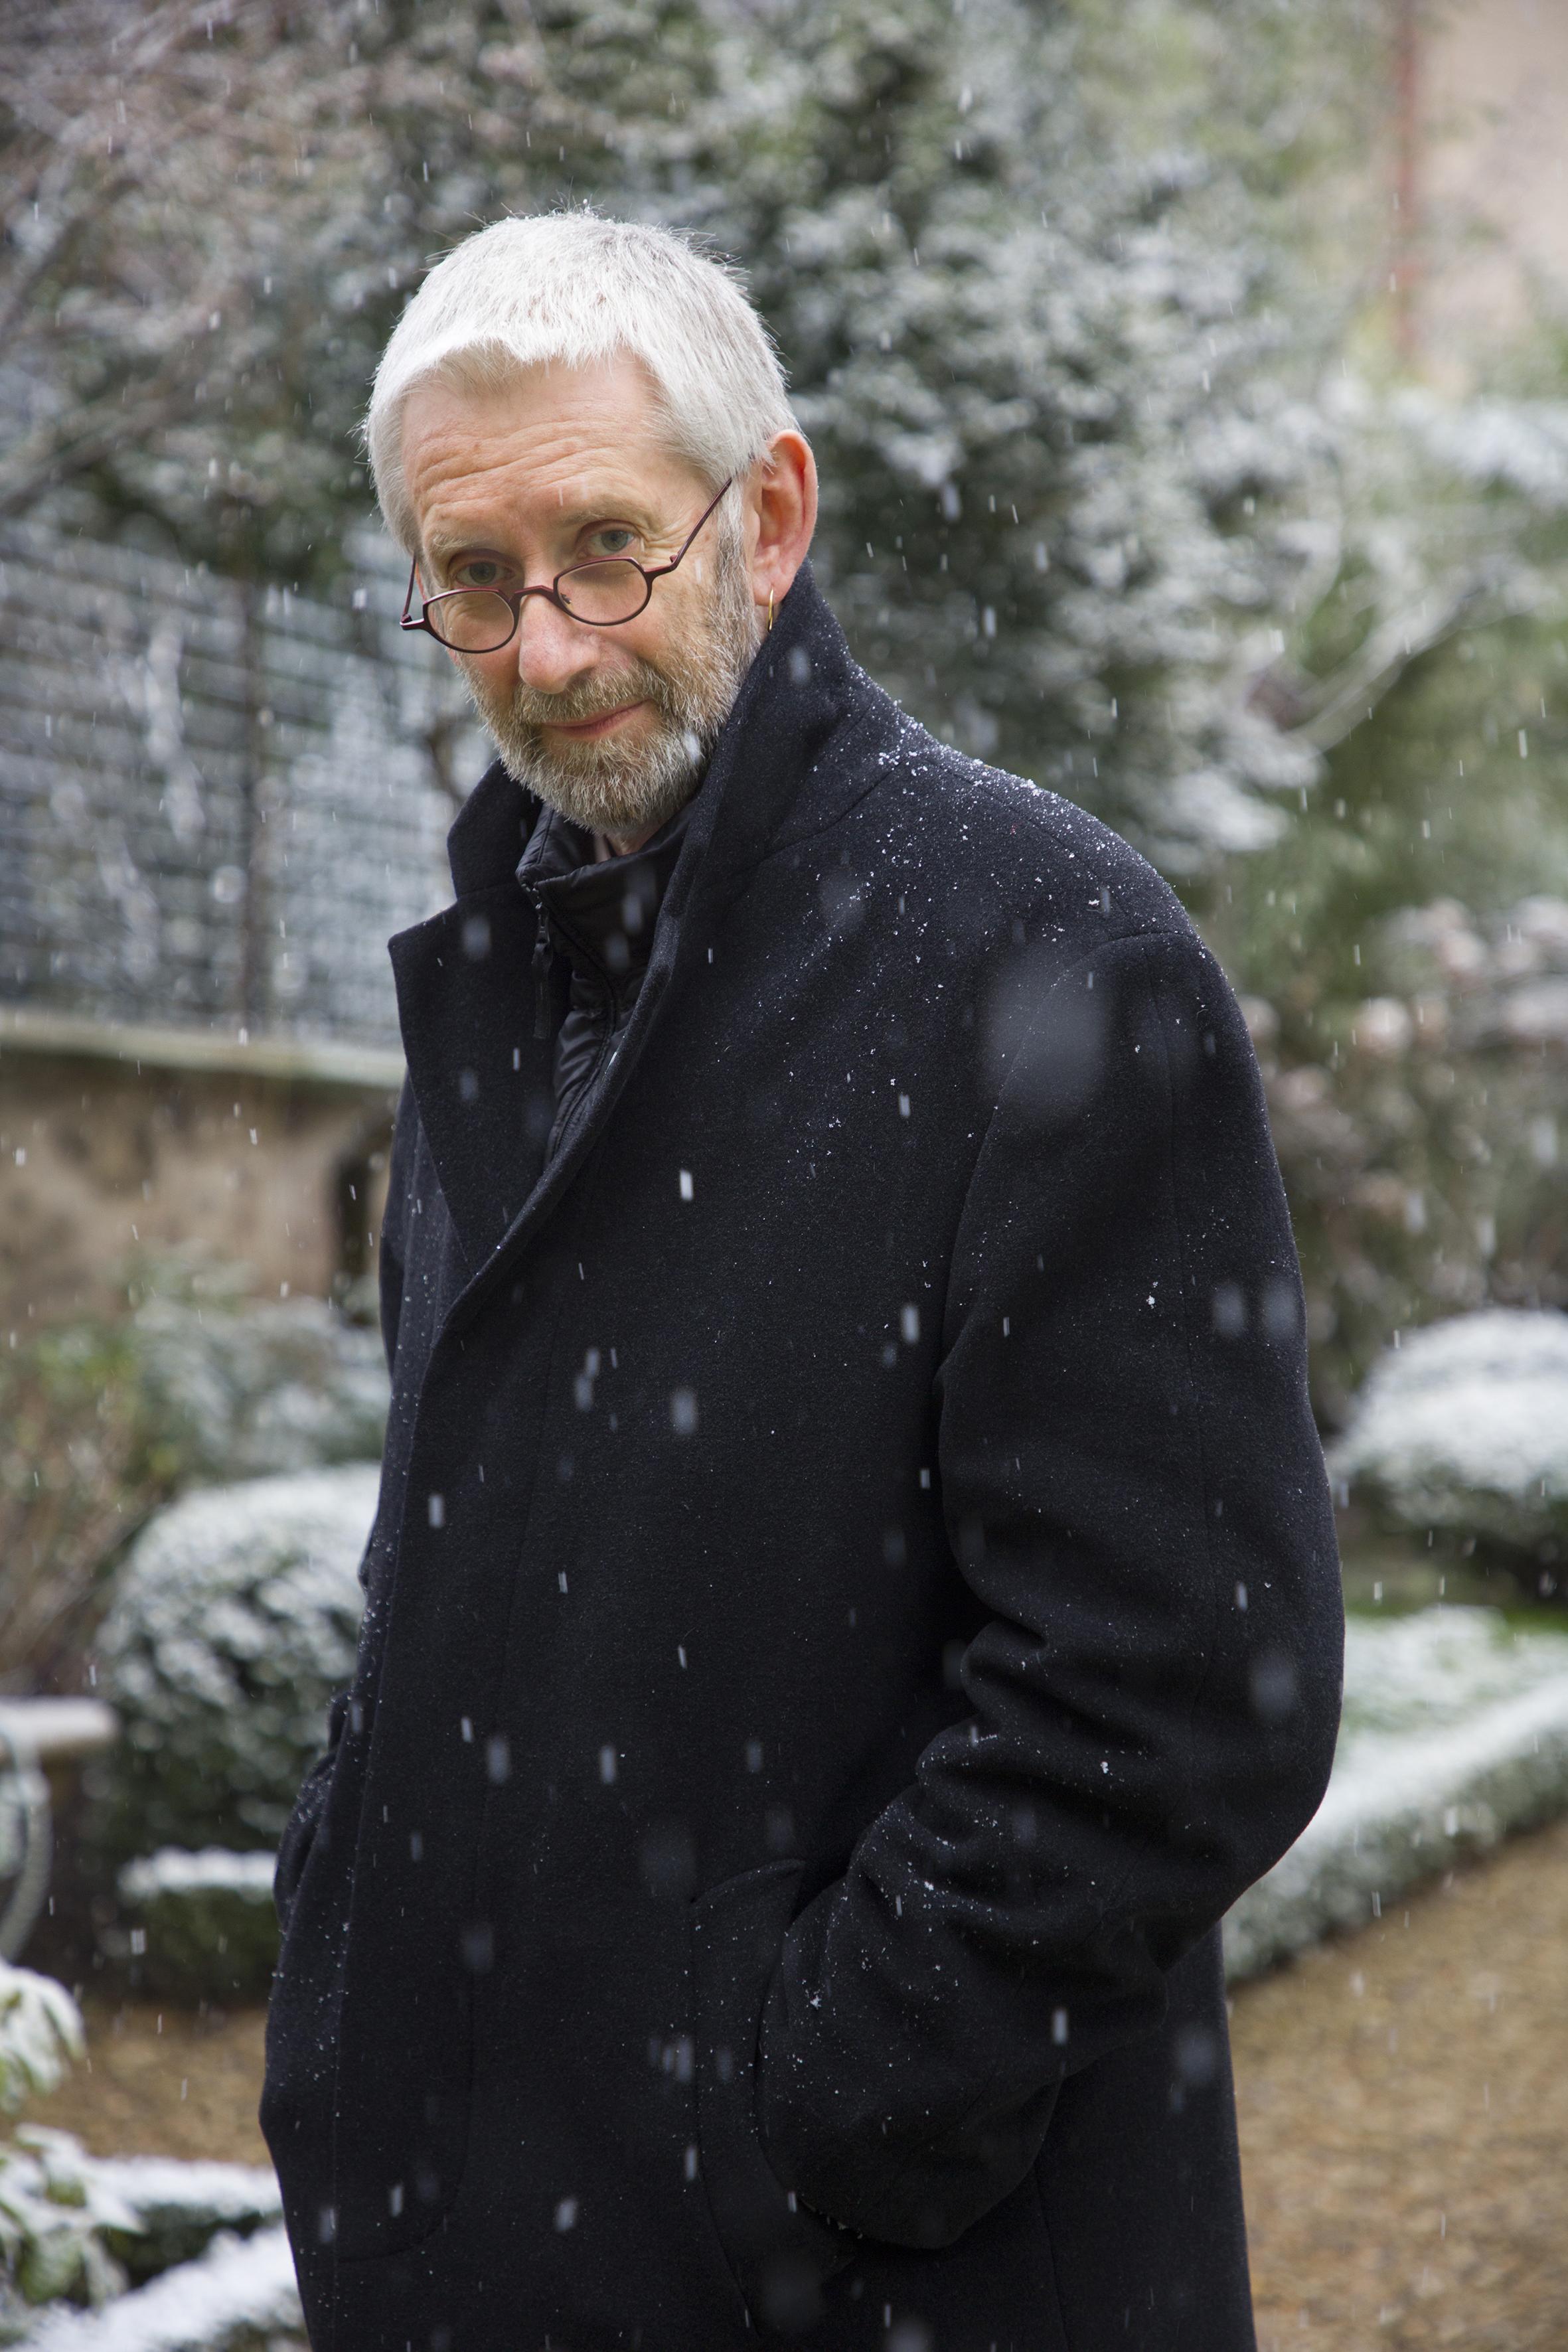 Patrick Pécherot